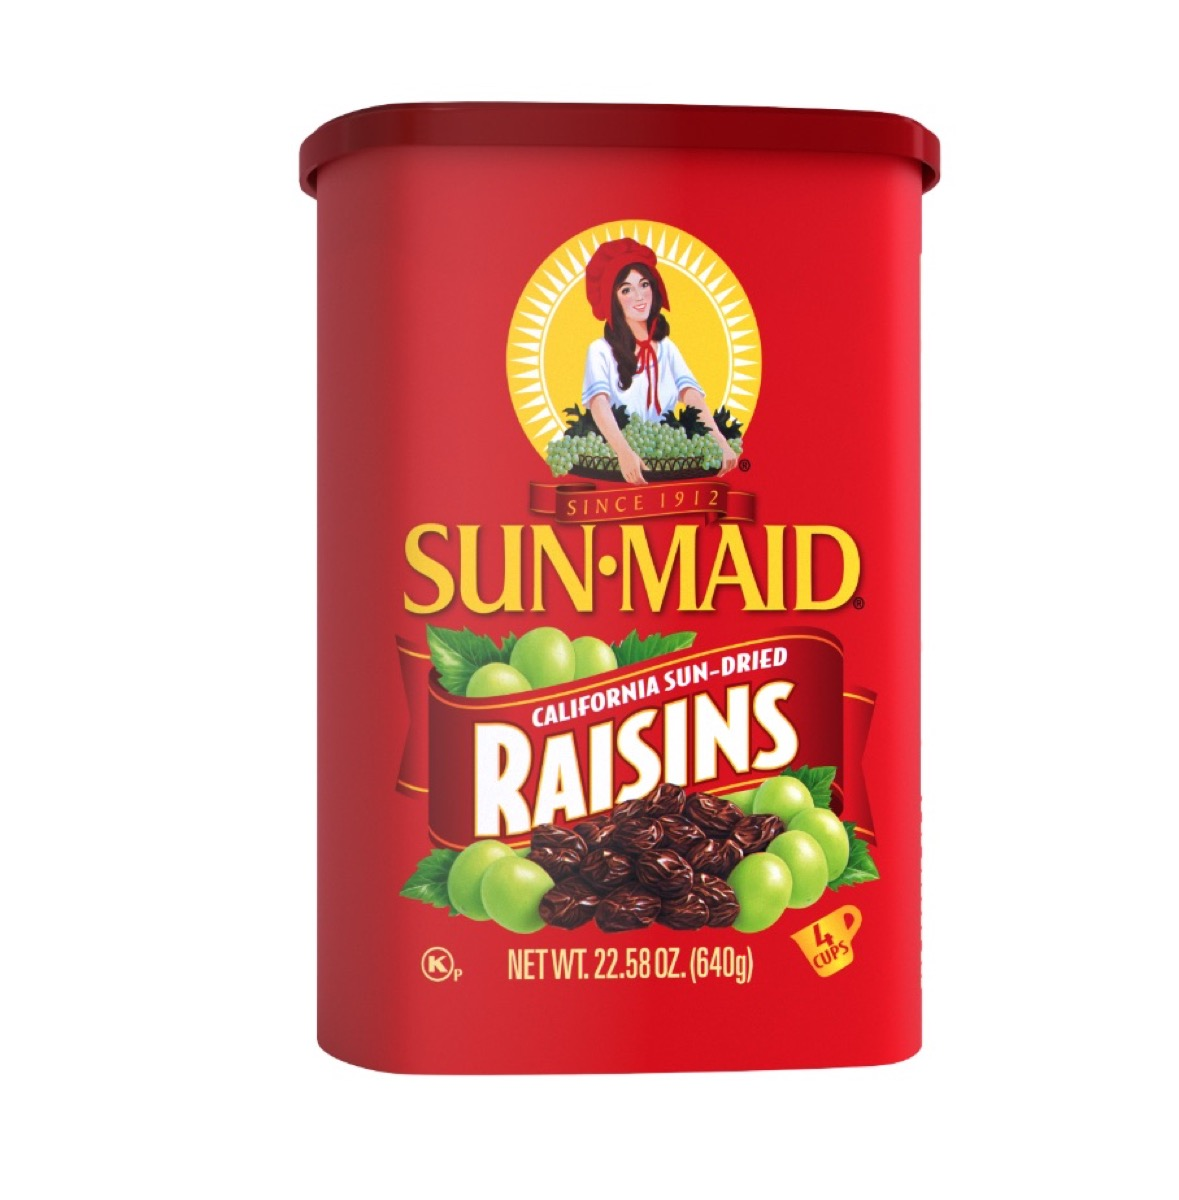 sun maid raisins, peanut free preschool snacks